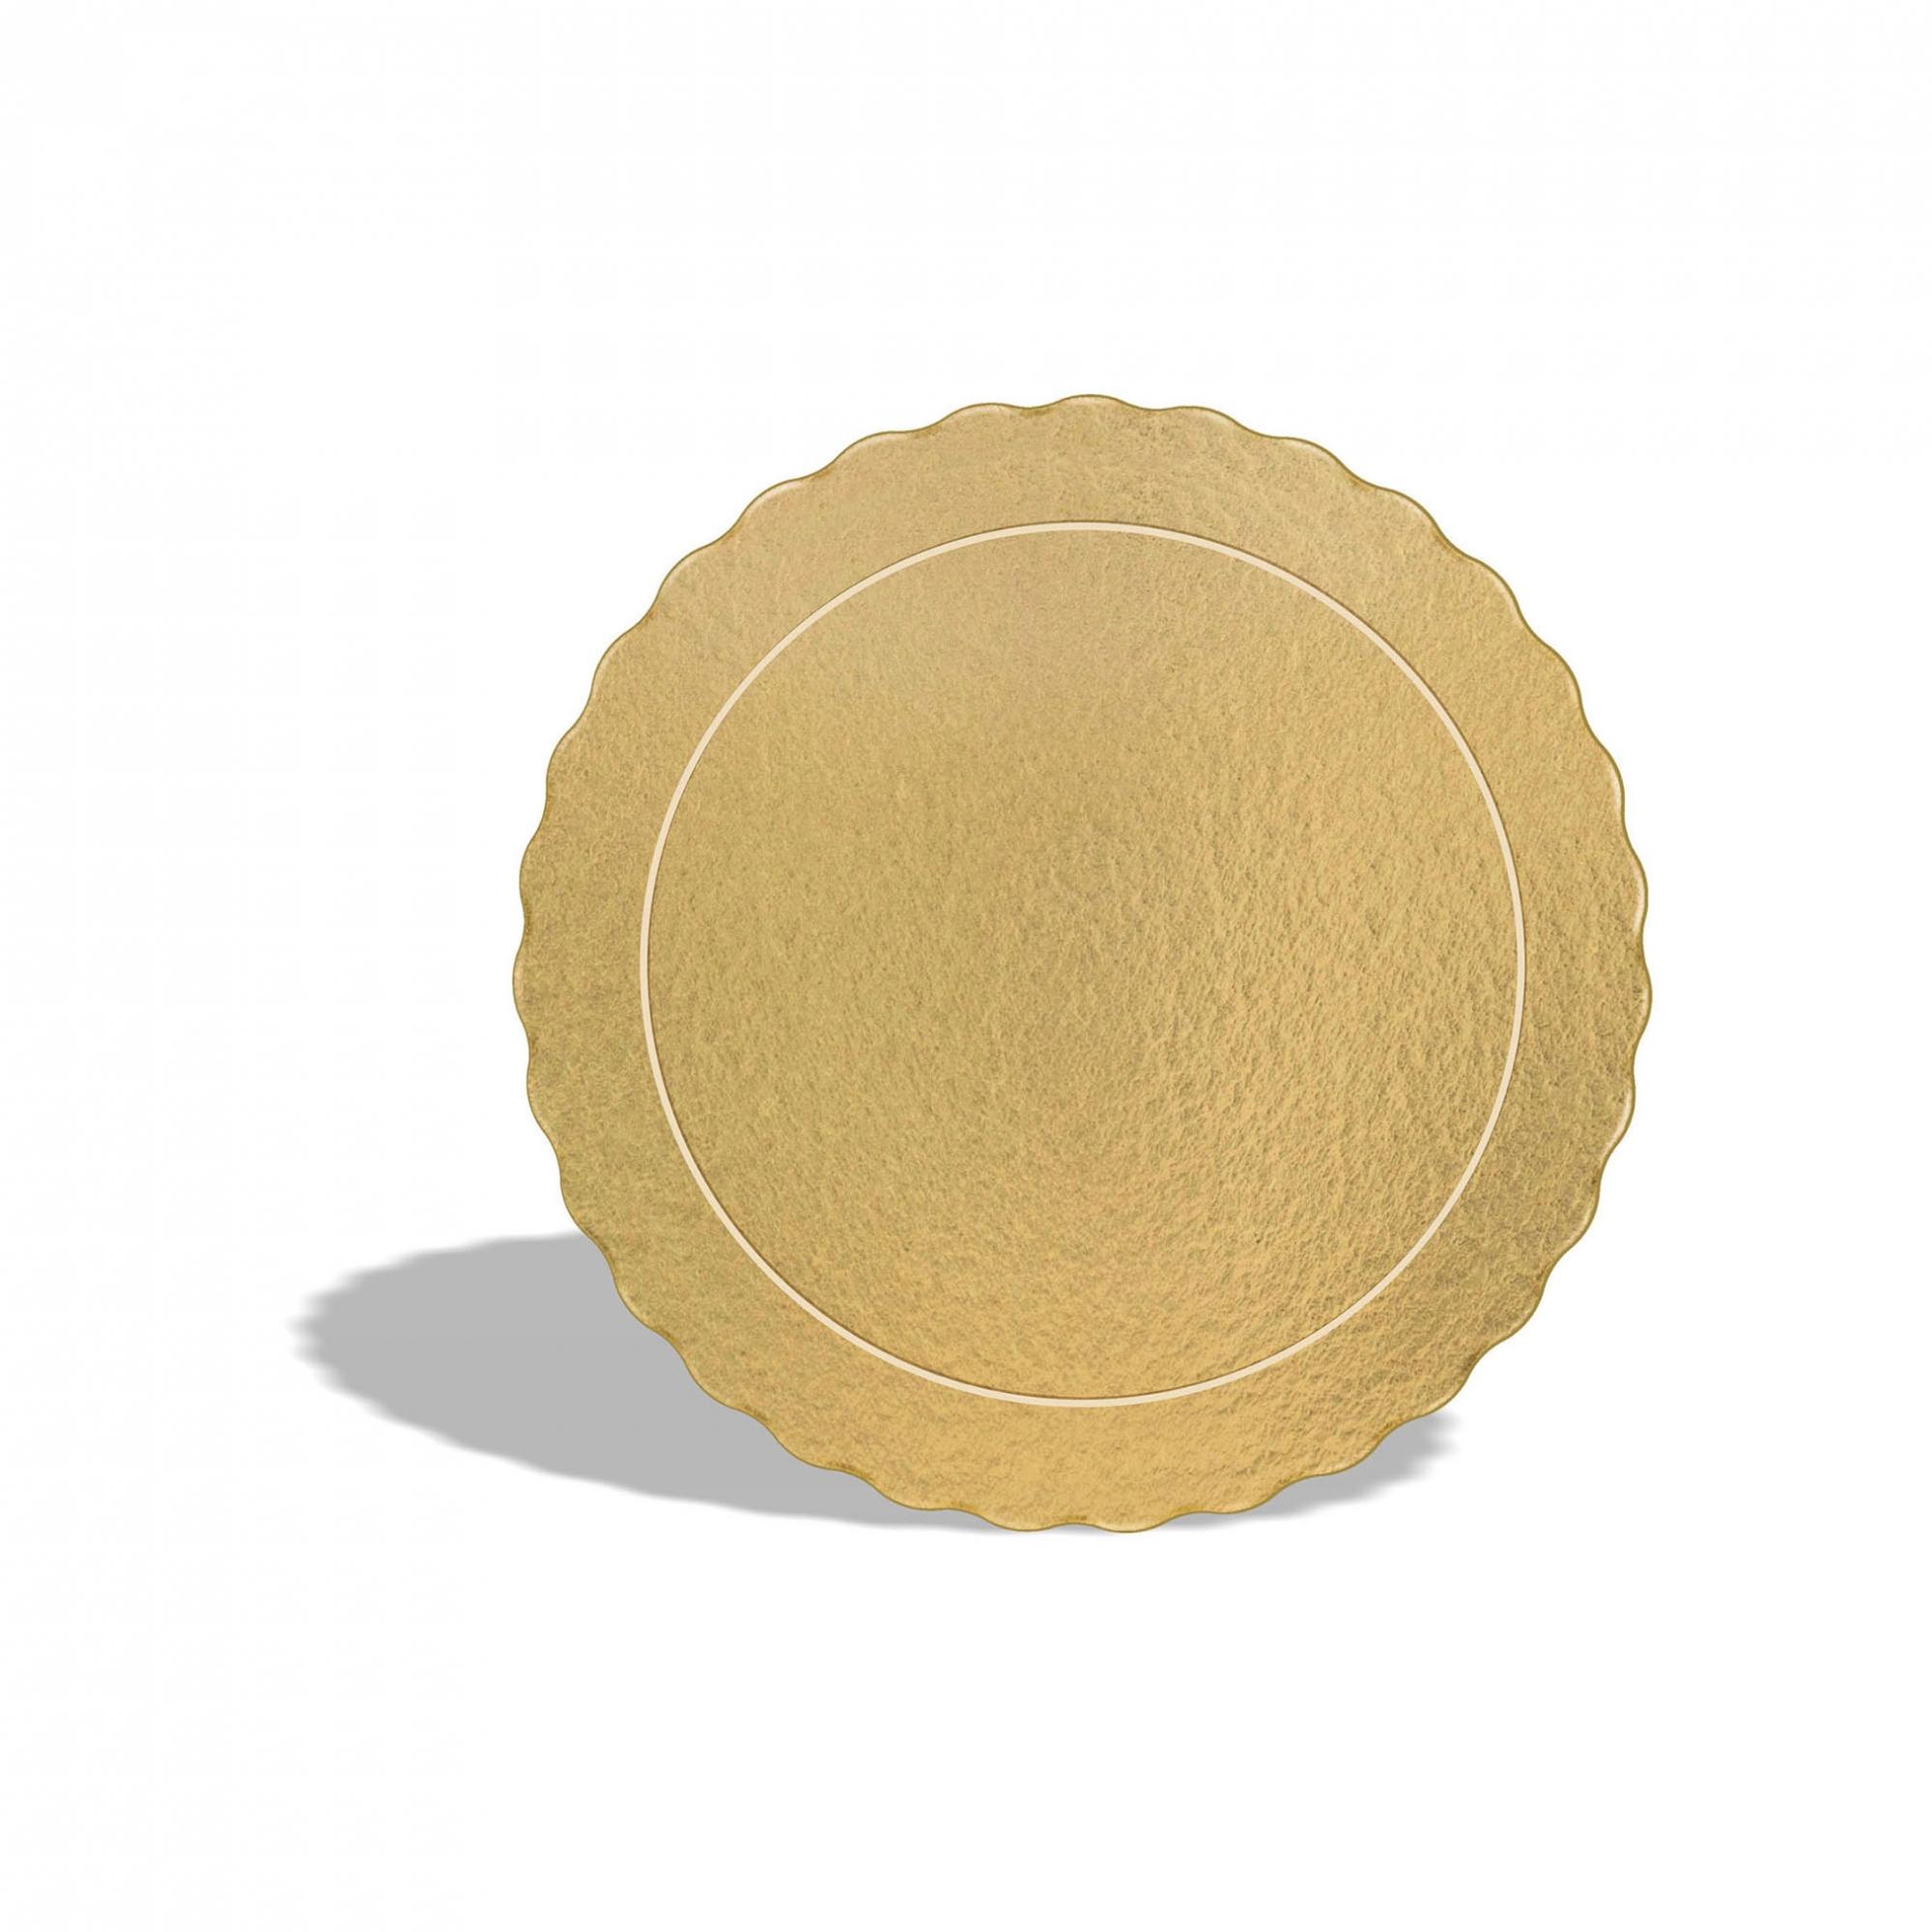 200 Bases Laminadas, Suporte P/ Bolo, Cake Board, 20cm - Ouro